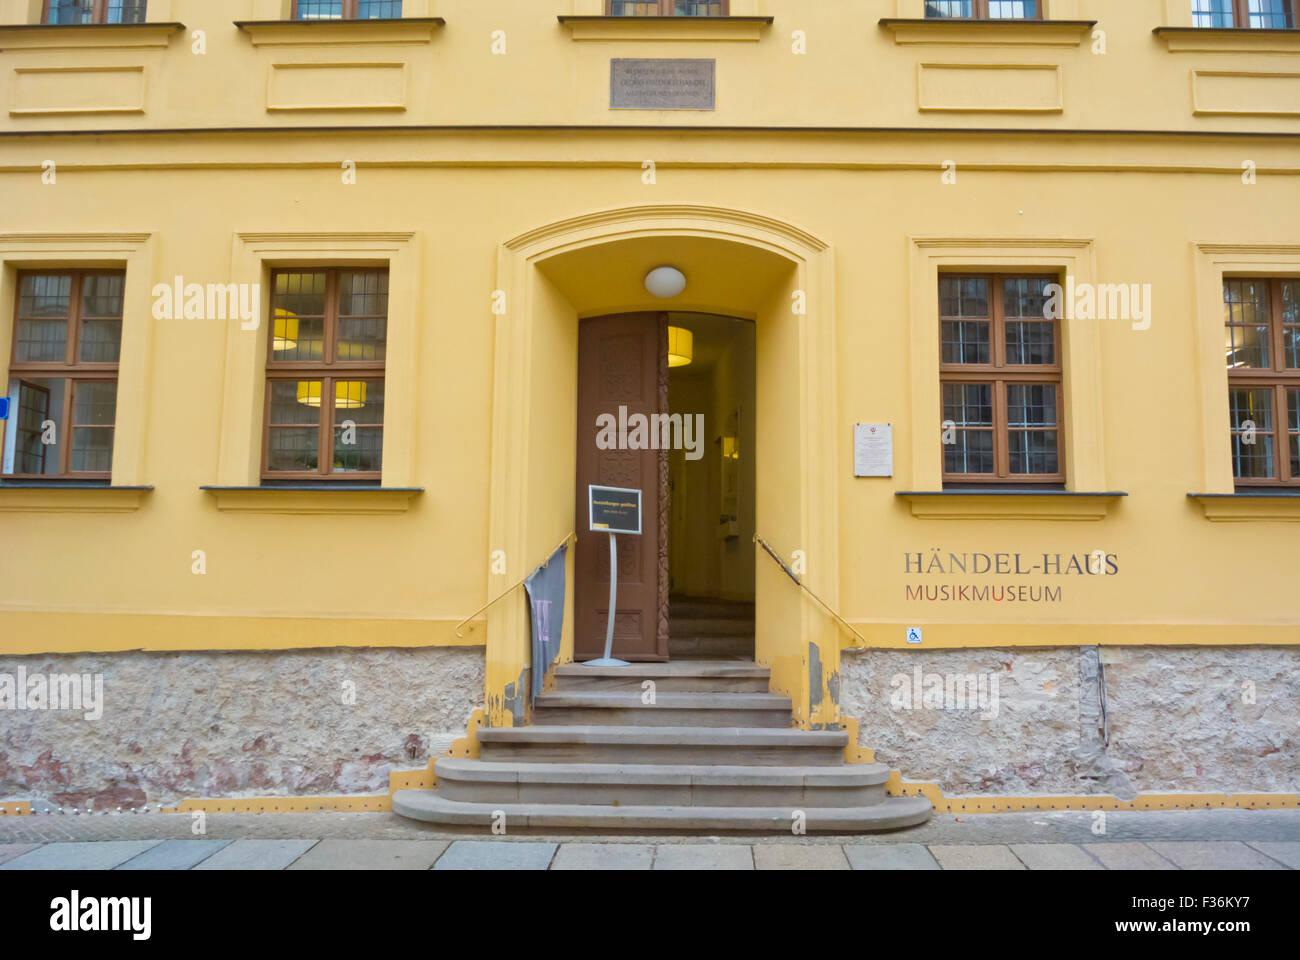 Musikmuseum, Music museum, Händel Haus, birthplace of Georg Friedrich Händel, Halle, Saxony-Anhalt, Germany - Stock Image